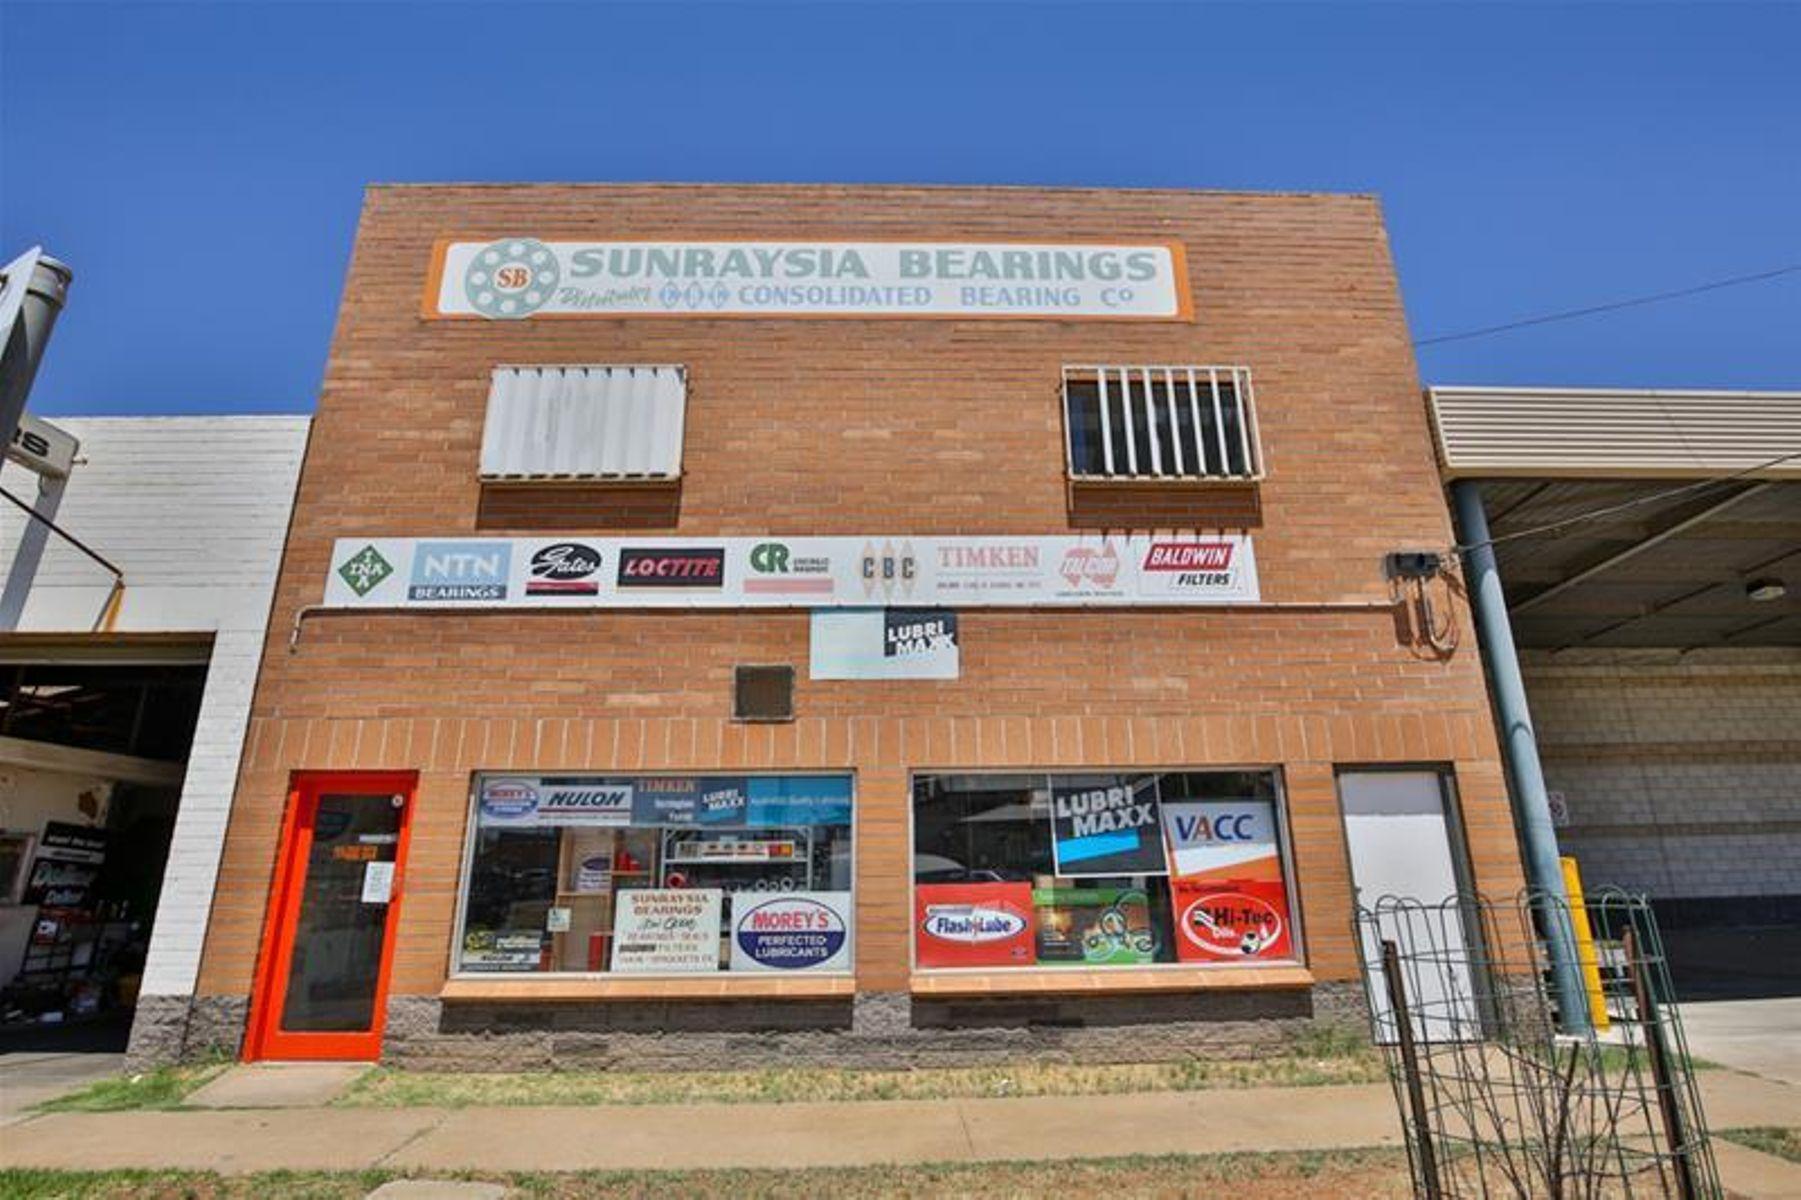 34 Orange Ave, Mildura VIC 3500, Australia , Other for Sale